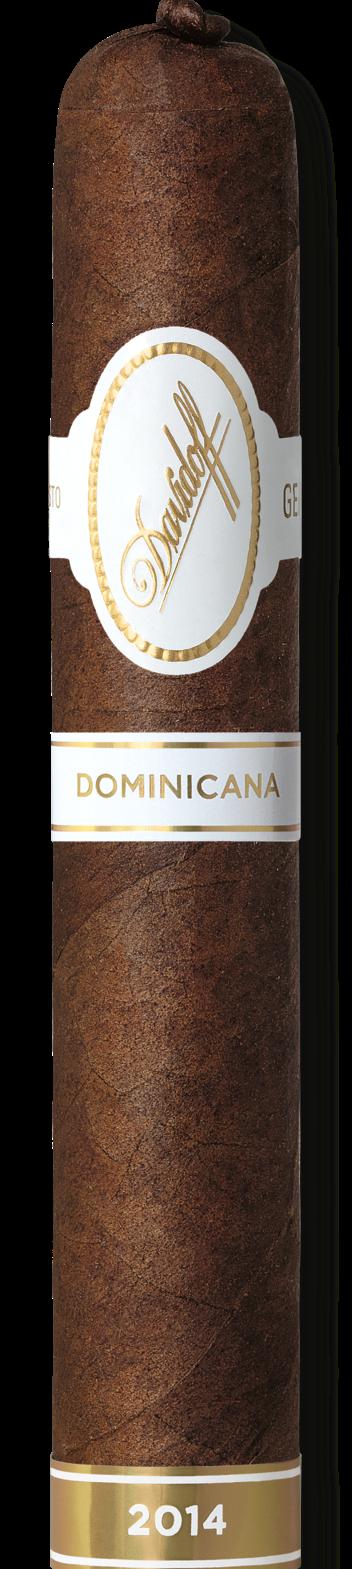 "Davidoff ""2021"" Dominicana Robusto"